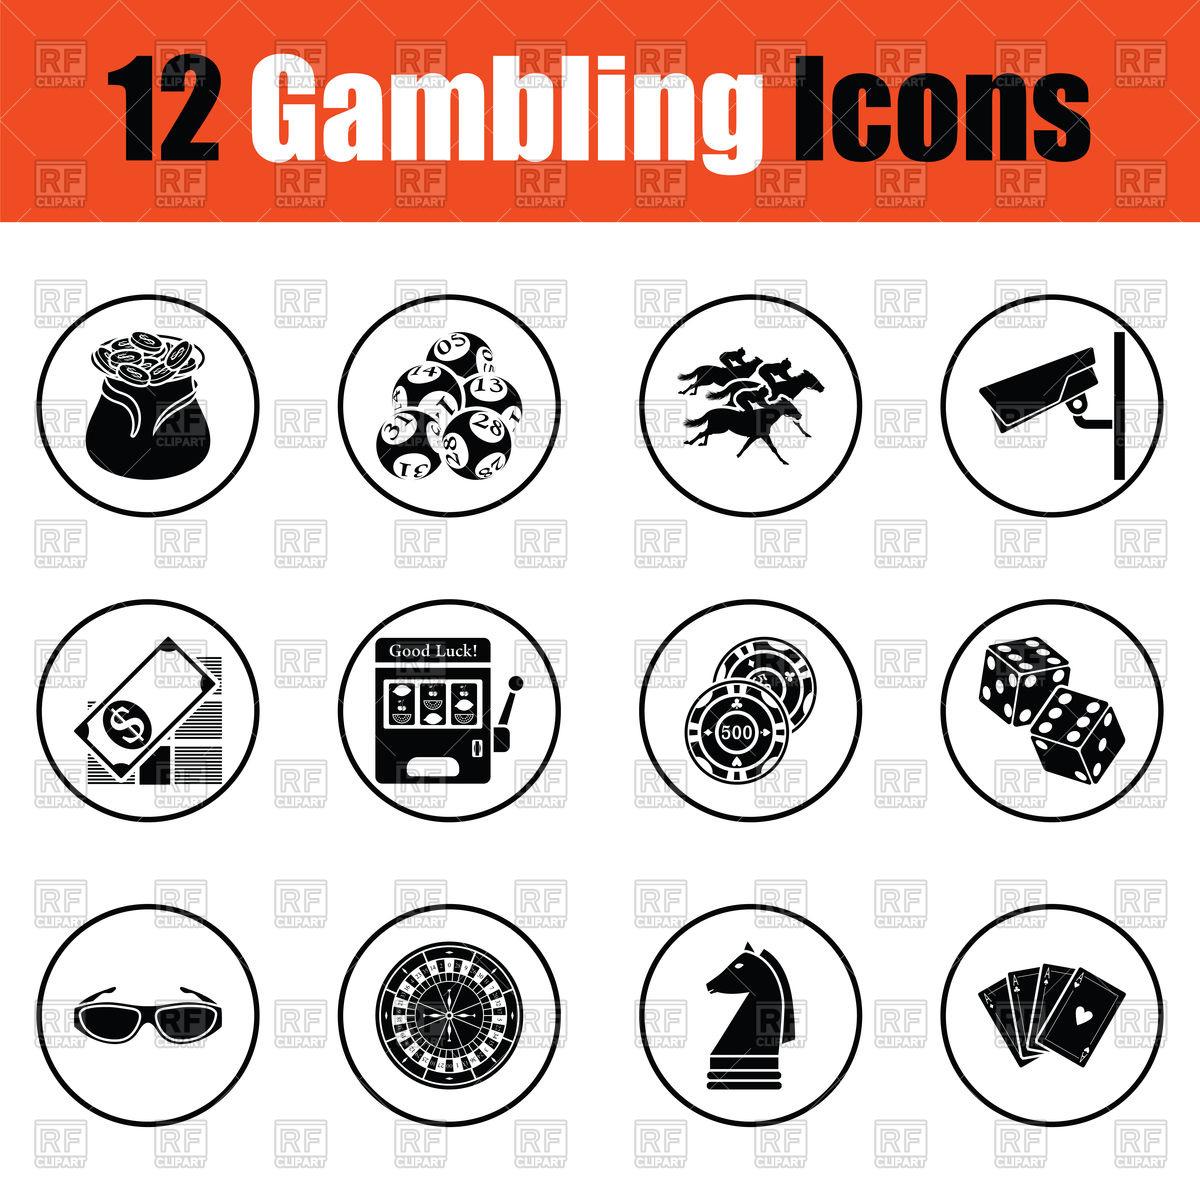 1200x1200 Gambling Icon Set Chess, Lottery, Horse Racing, Poker Vector